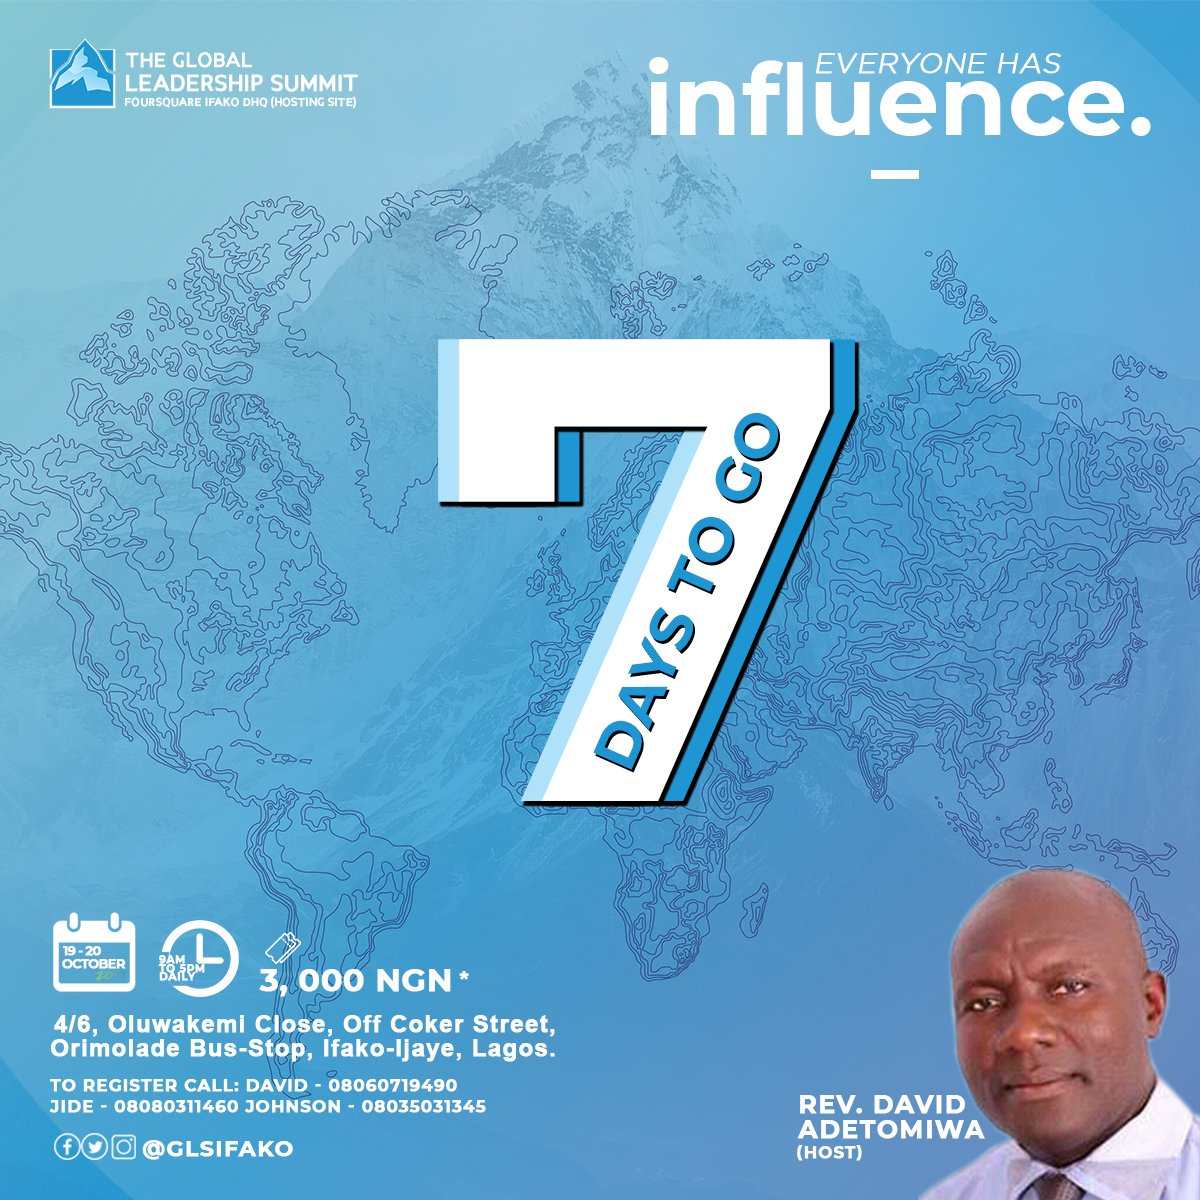 It is 7 days to go #GLS18 #EveryoneHasInfluence  #GLS #GLSIFAKO #GLSNIG @wcagls @gls_nigeria<br>http://pic.twitter.com/ioszHMOgyr